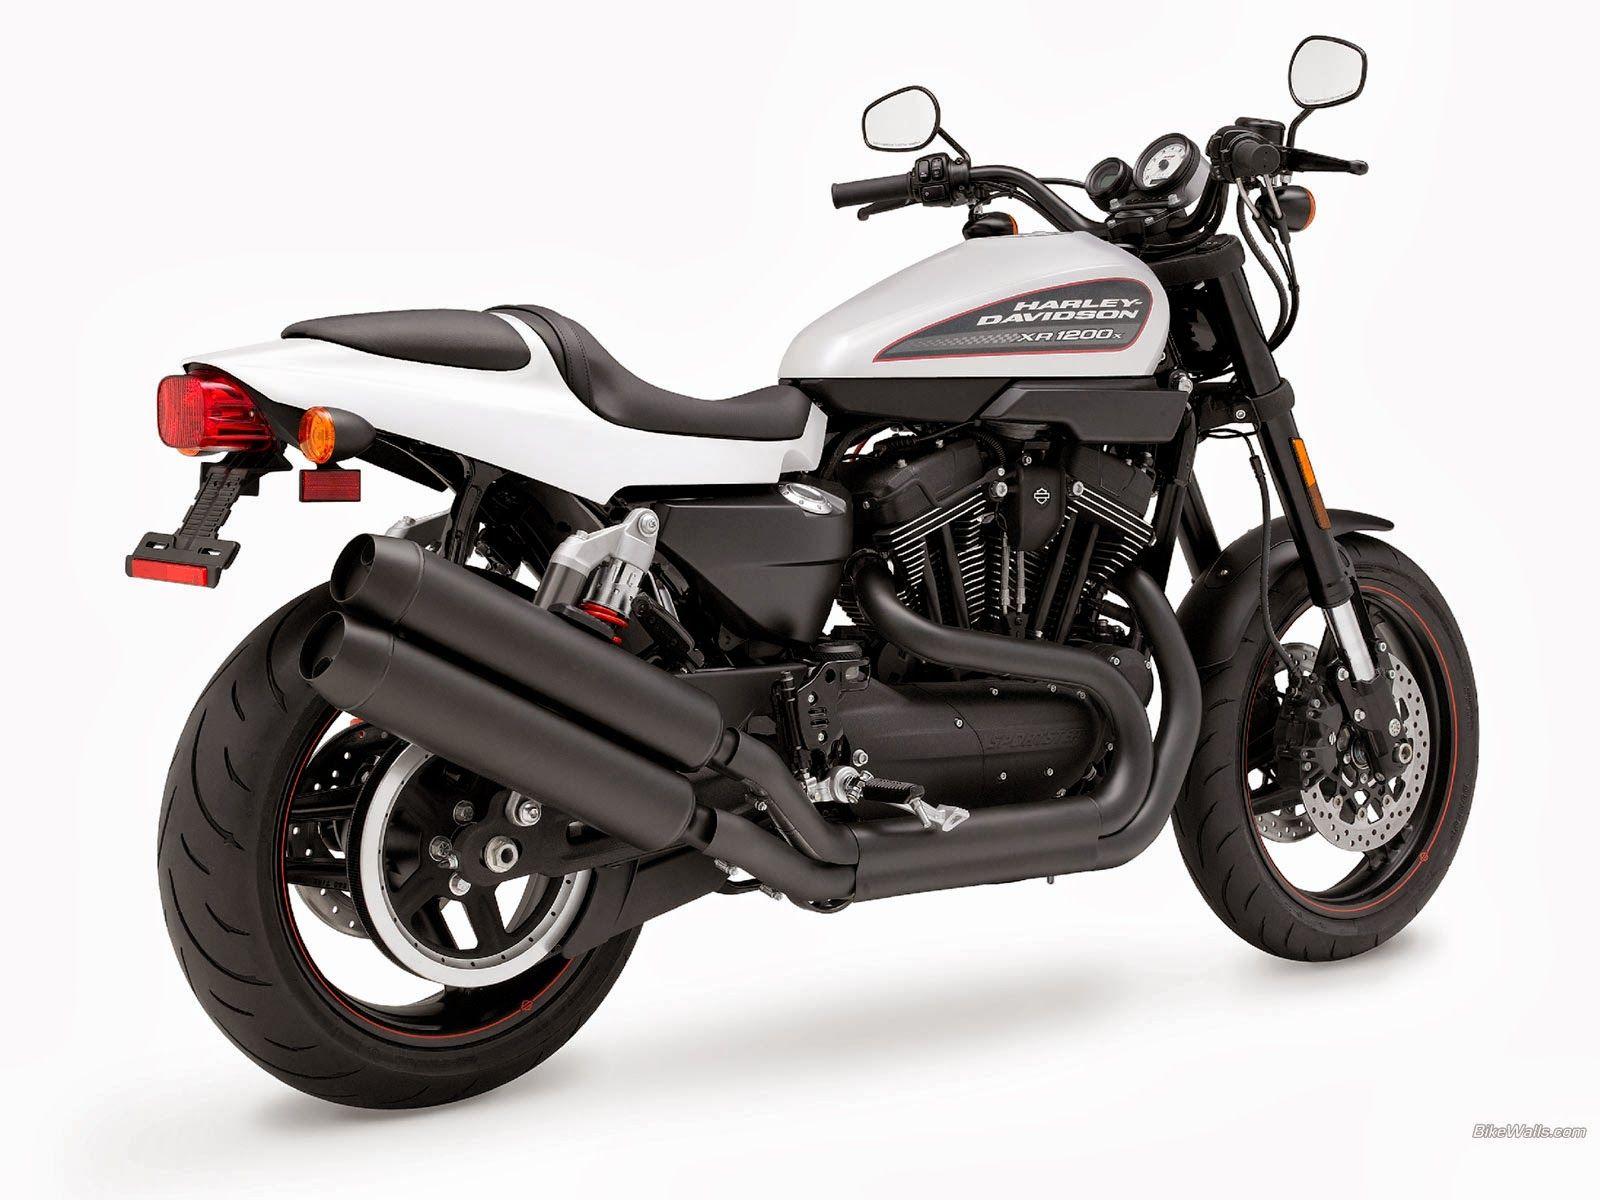 '09 XR1200 (With images) Harley davidson, Harley